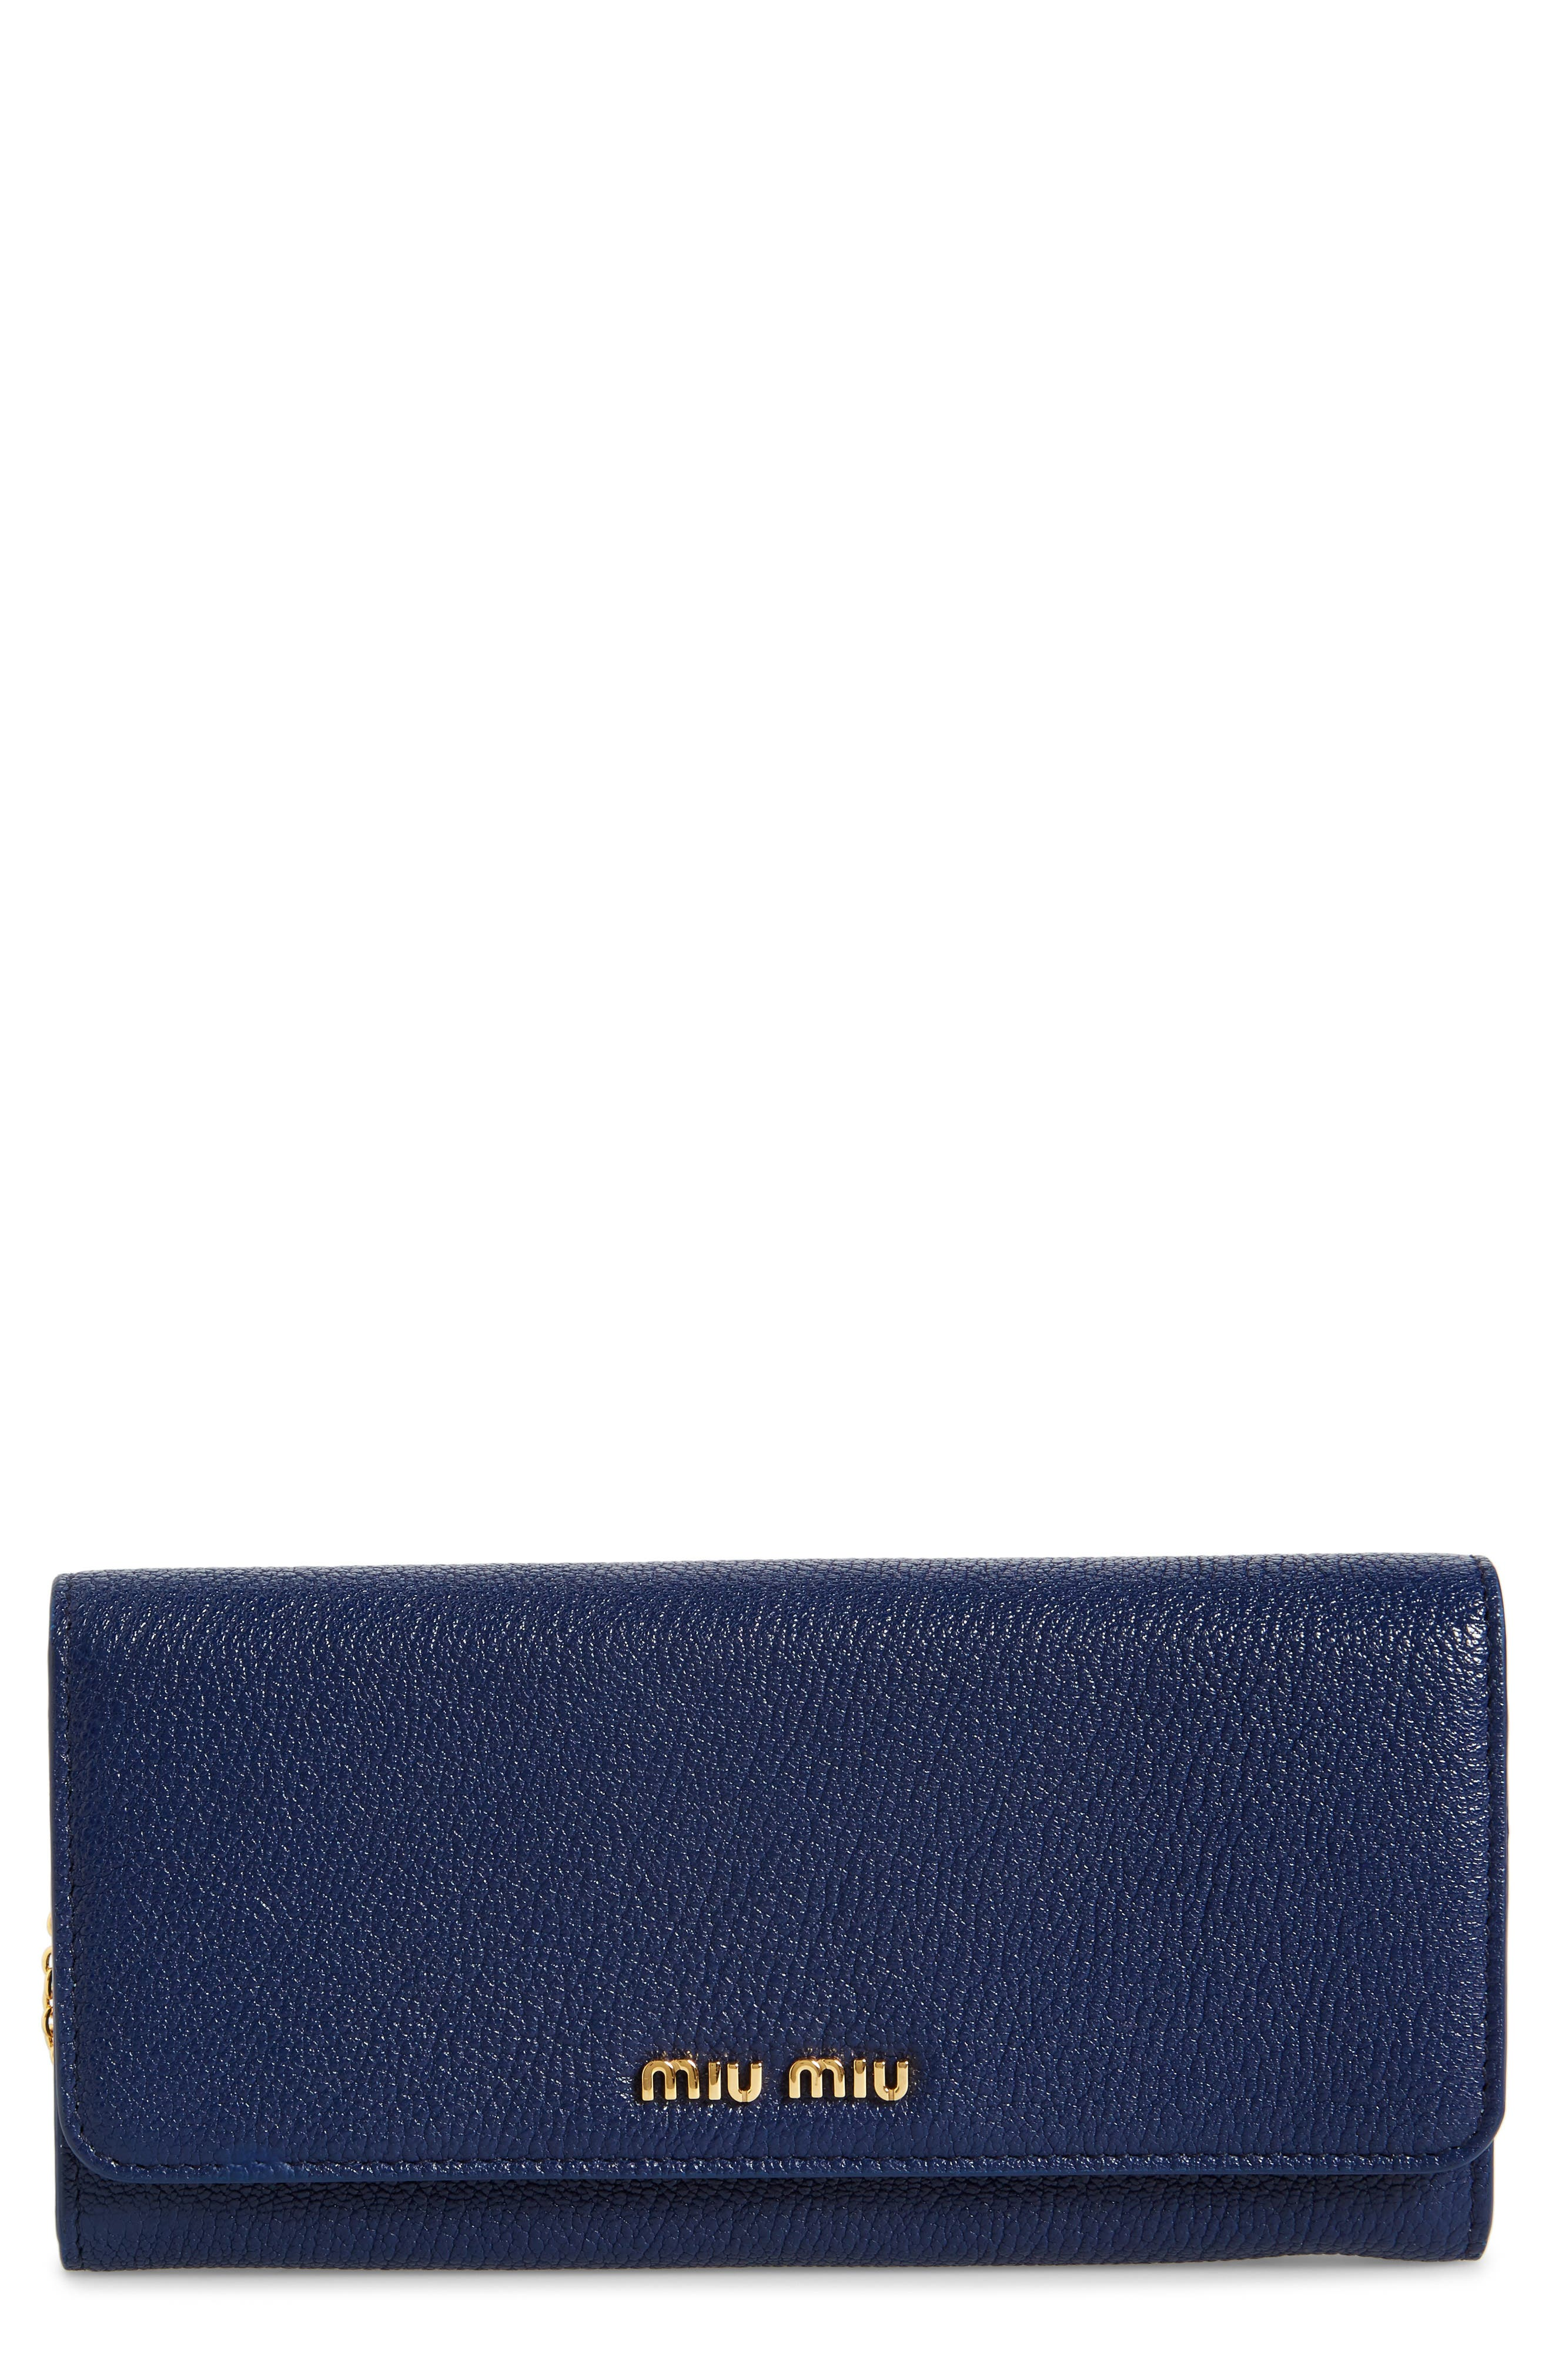 Main Image - Miu Miu Madras Goatskin Leather Continental Wallet